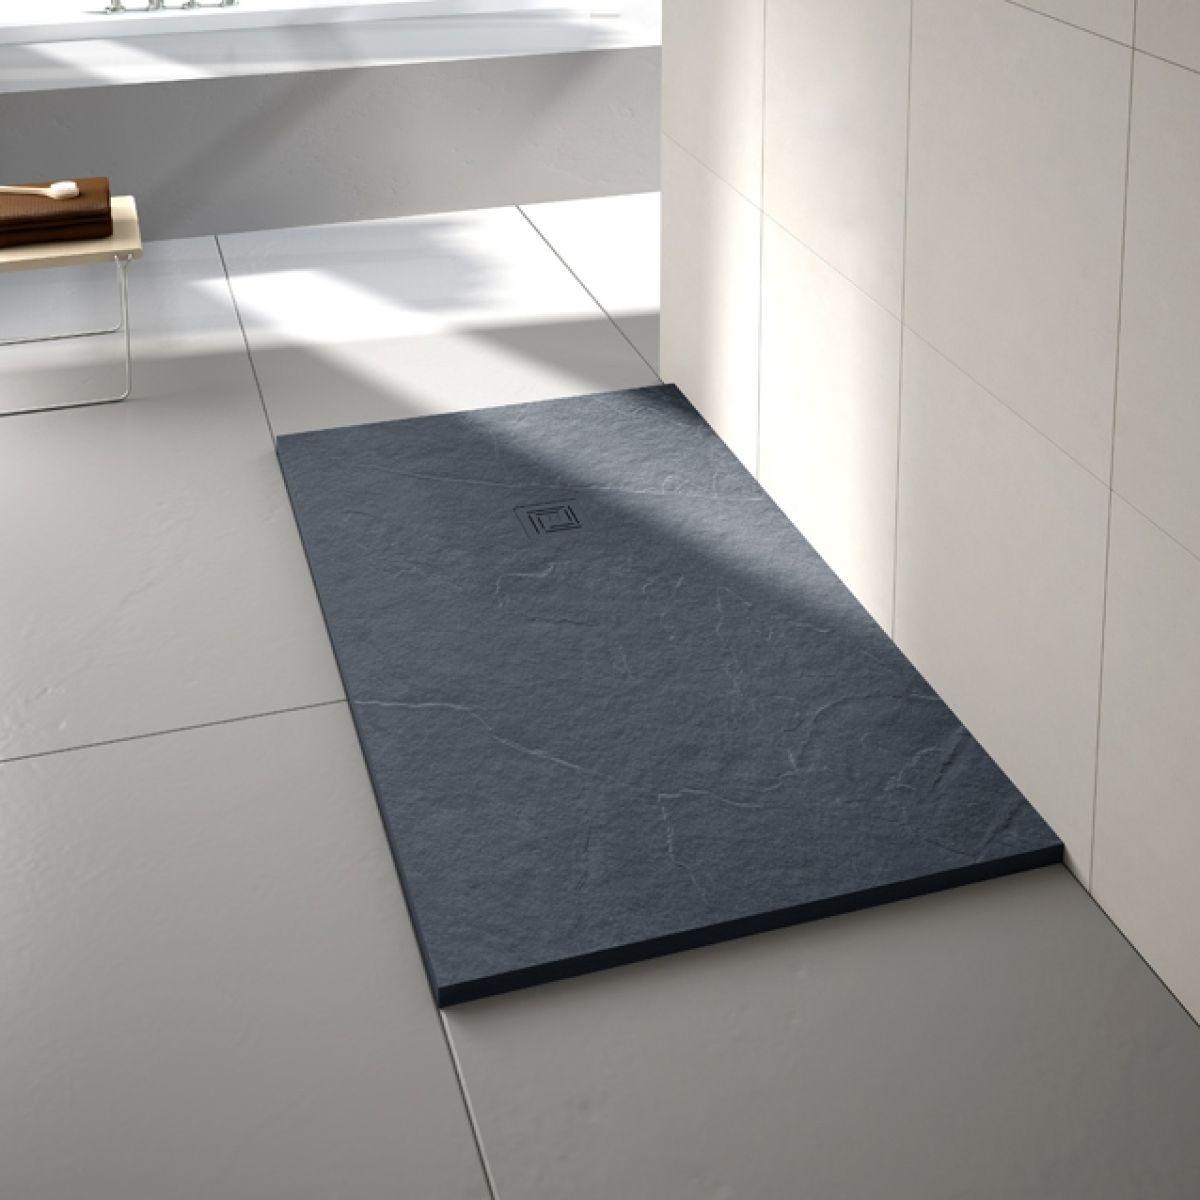 Merlyn Truestone Slate Black Rectangular Shower Tray 1200 x 800mm